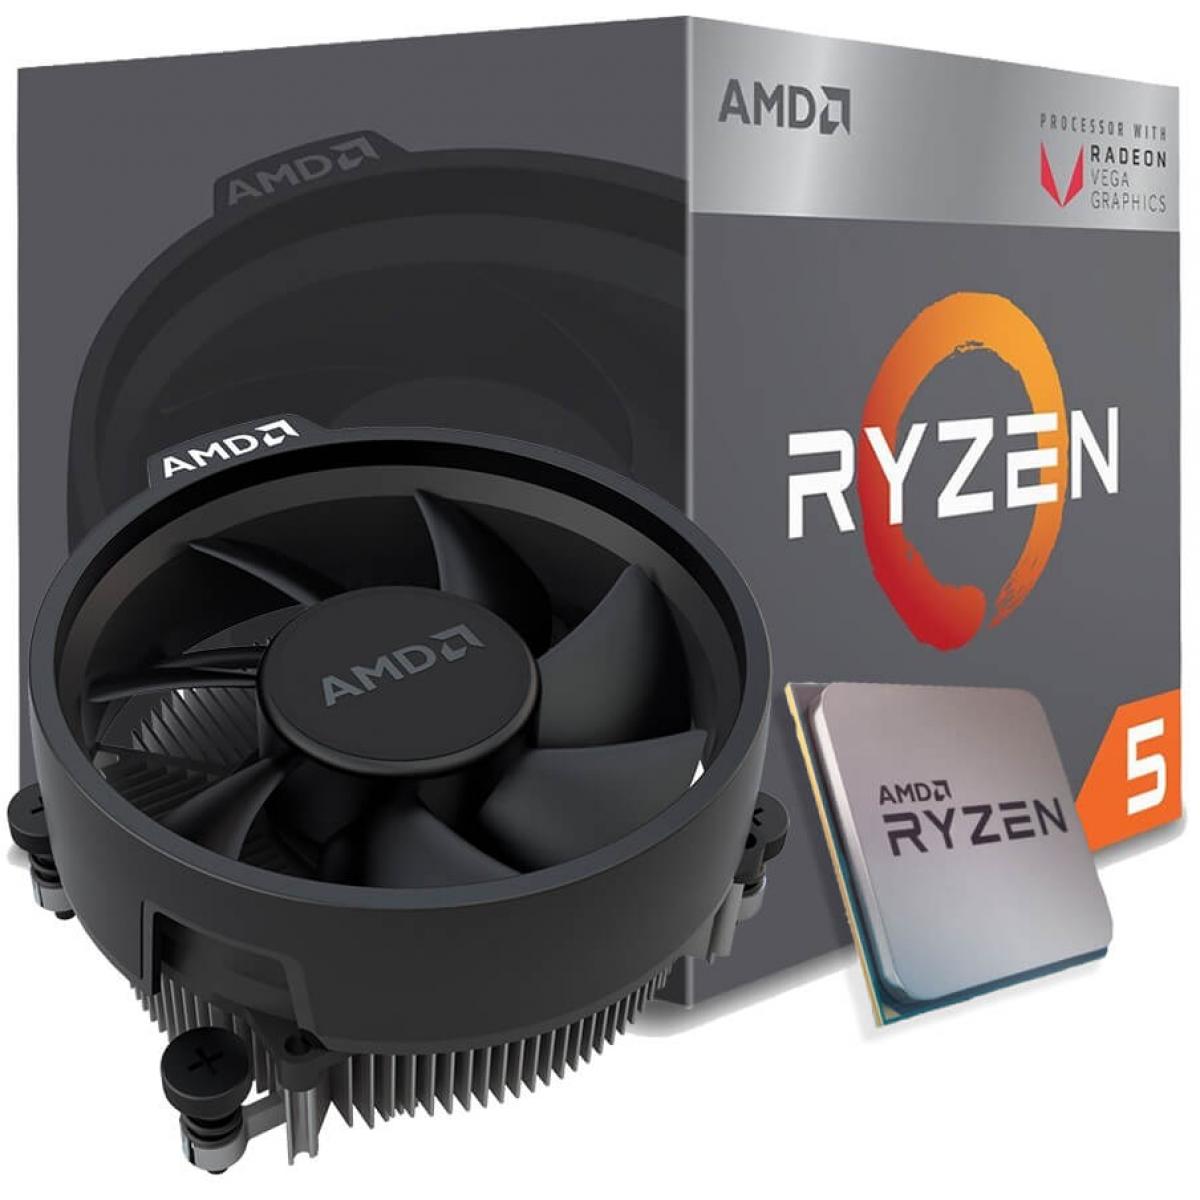 Processador AMD Ryzen 5 2400G 3.6GHz (3.9GHz Turbo), 4-Cores 8-Threads, Cooler Wraith Stealth, AM4, YD2400C5FBBOX